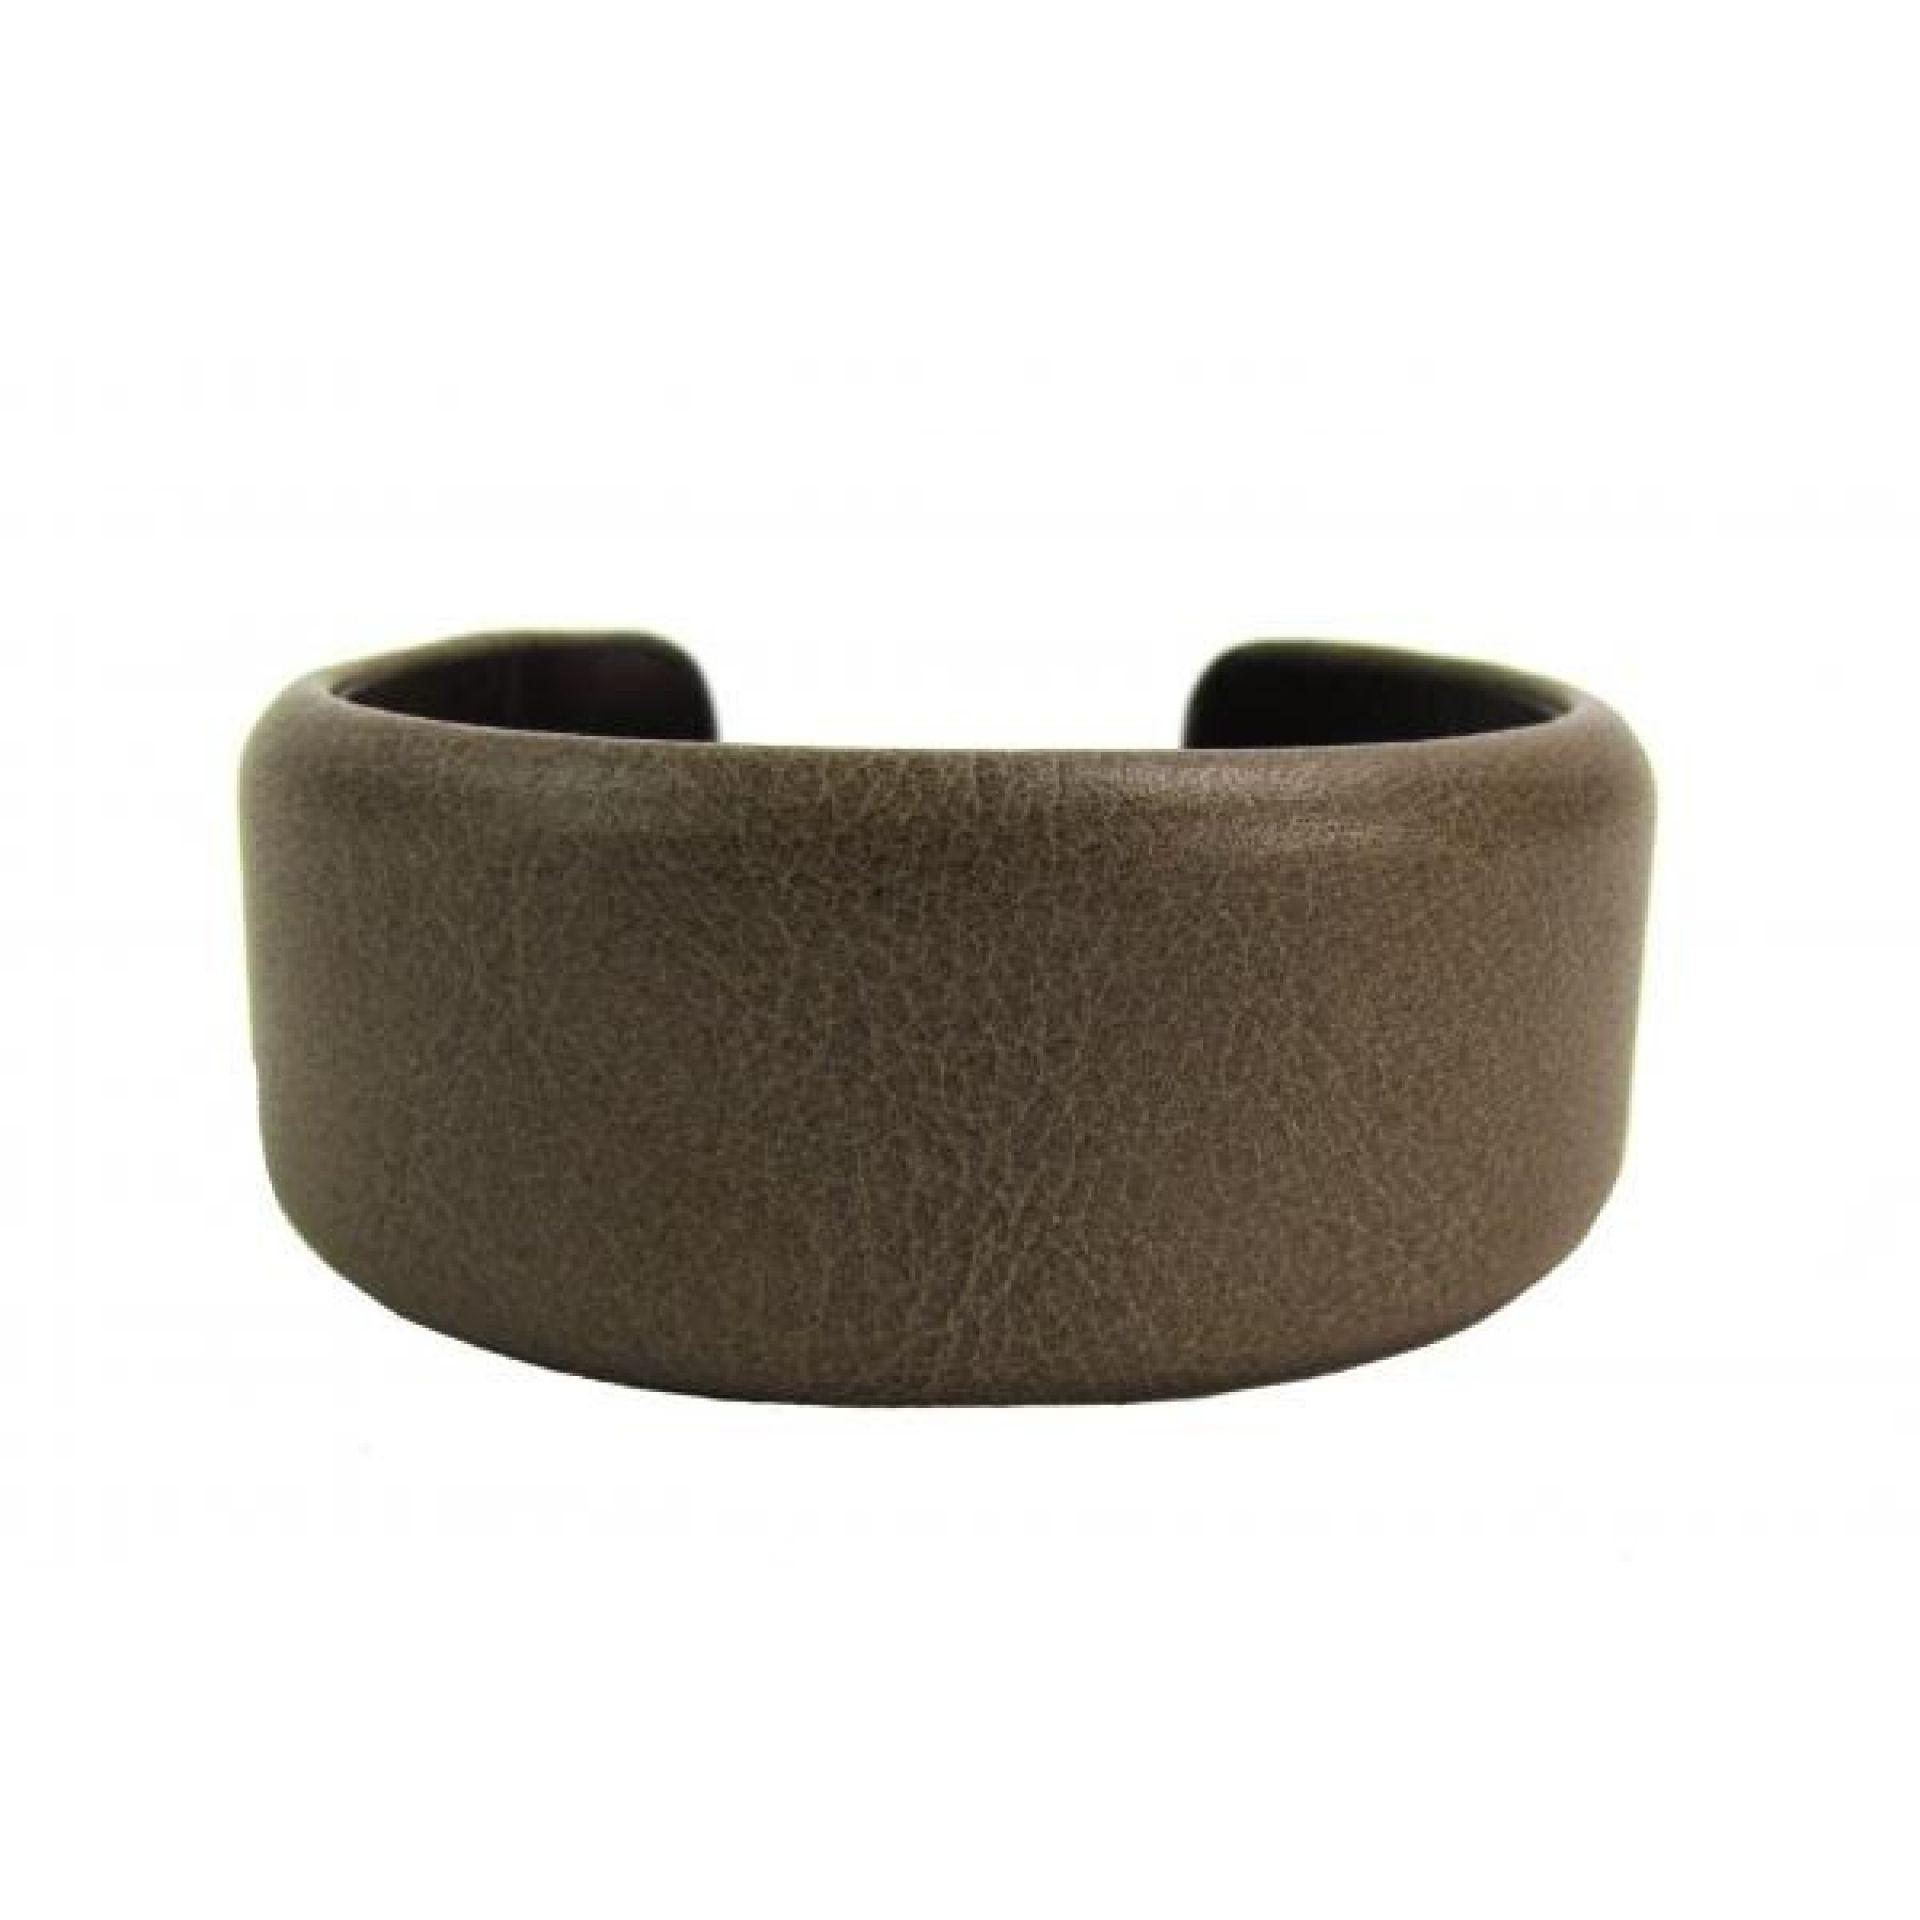 Brunello Cucinelli Beige Leather Cuff Bracelet